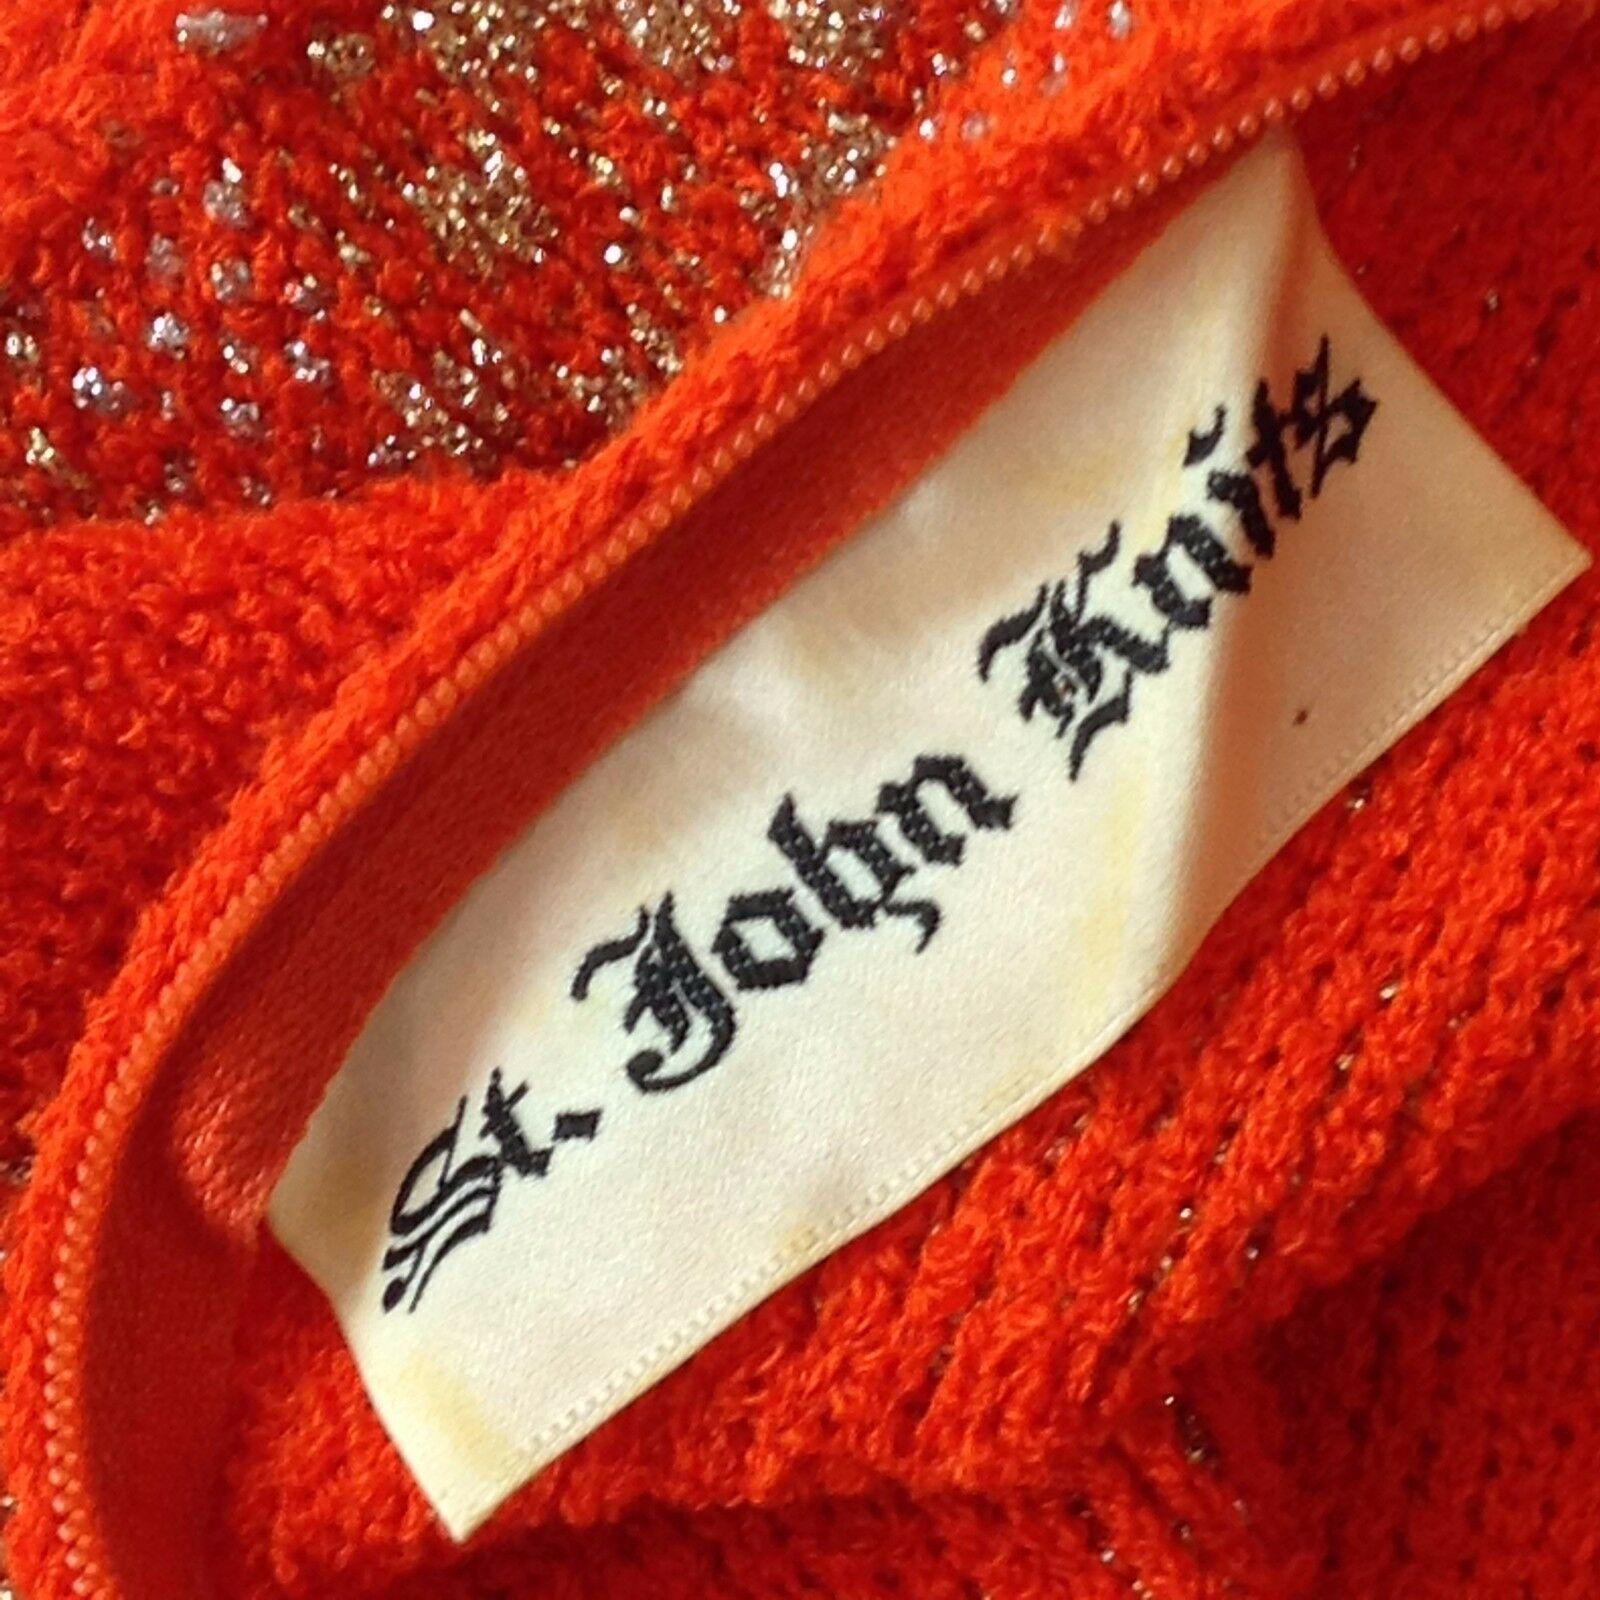 Vtg St John Knits Wiggle Groovy Hostess Sweater Dress Orange Gold Metallic M image 5